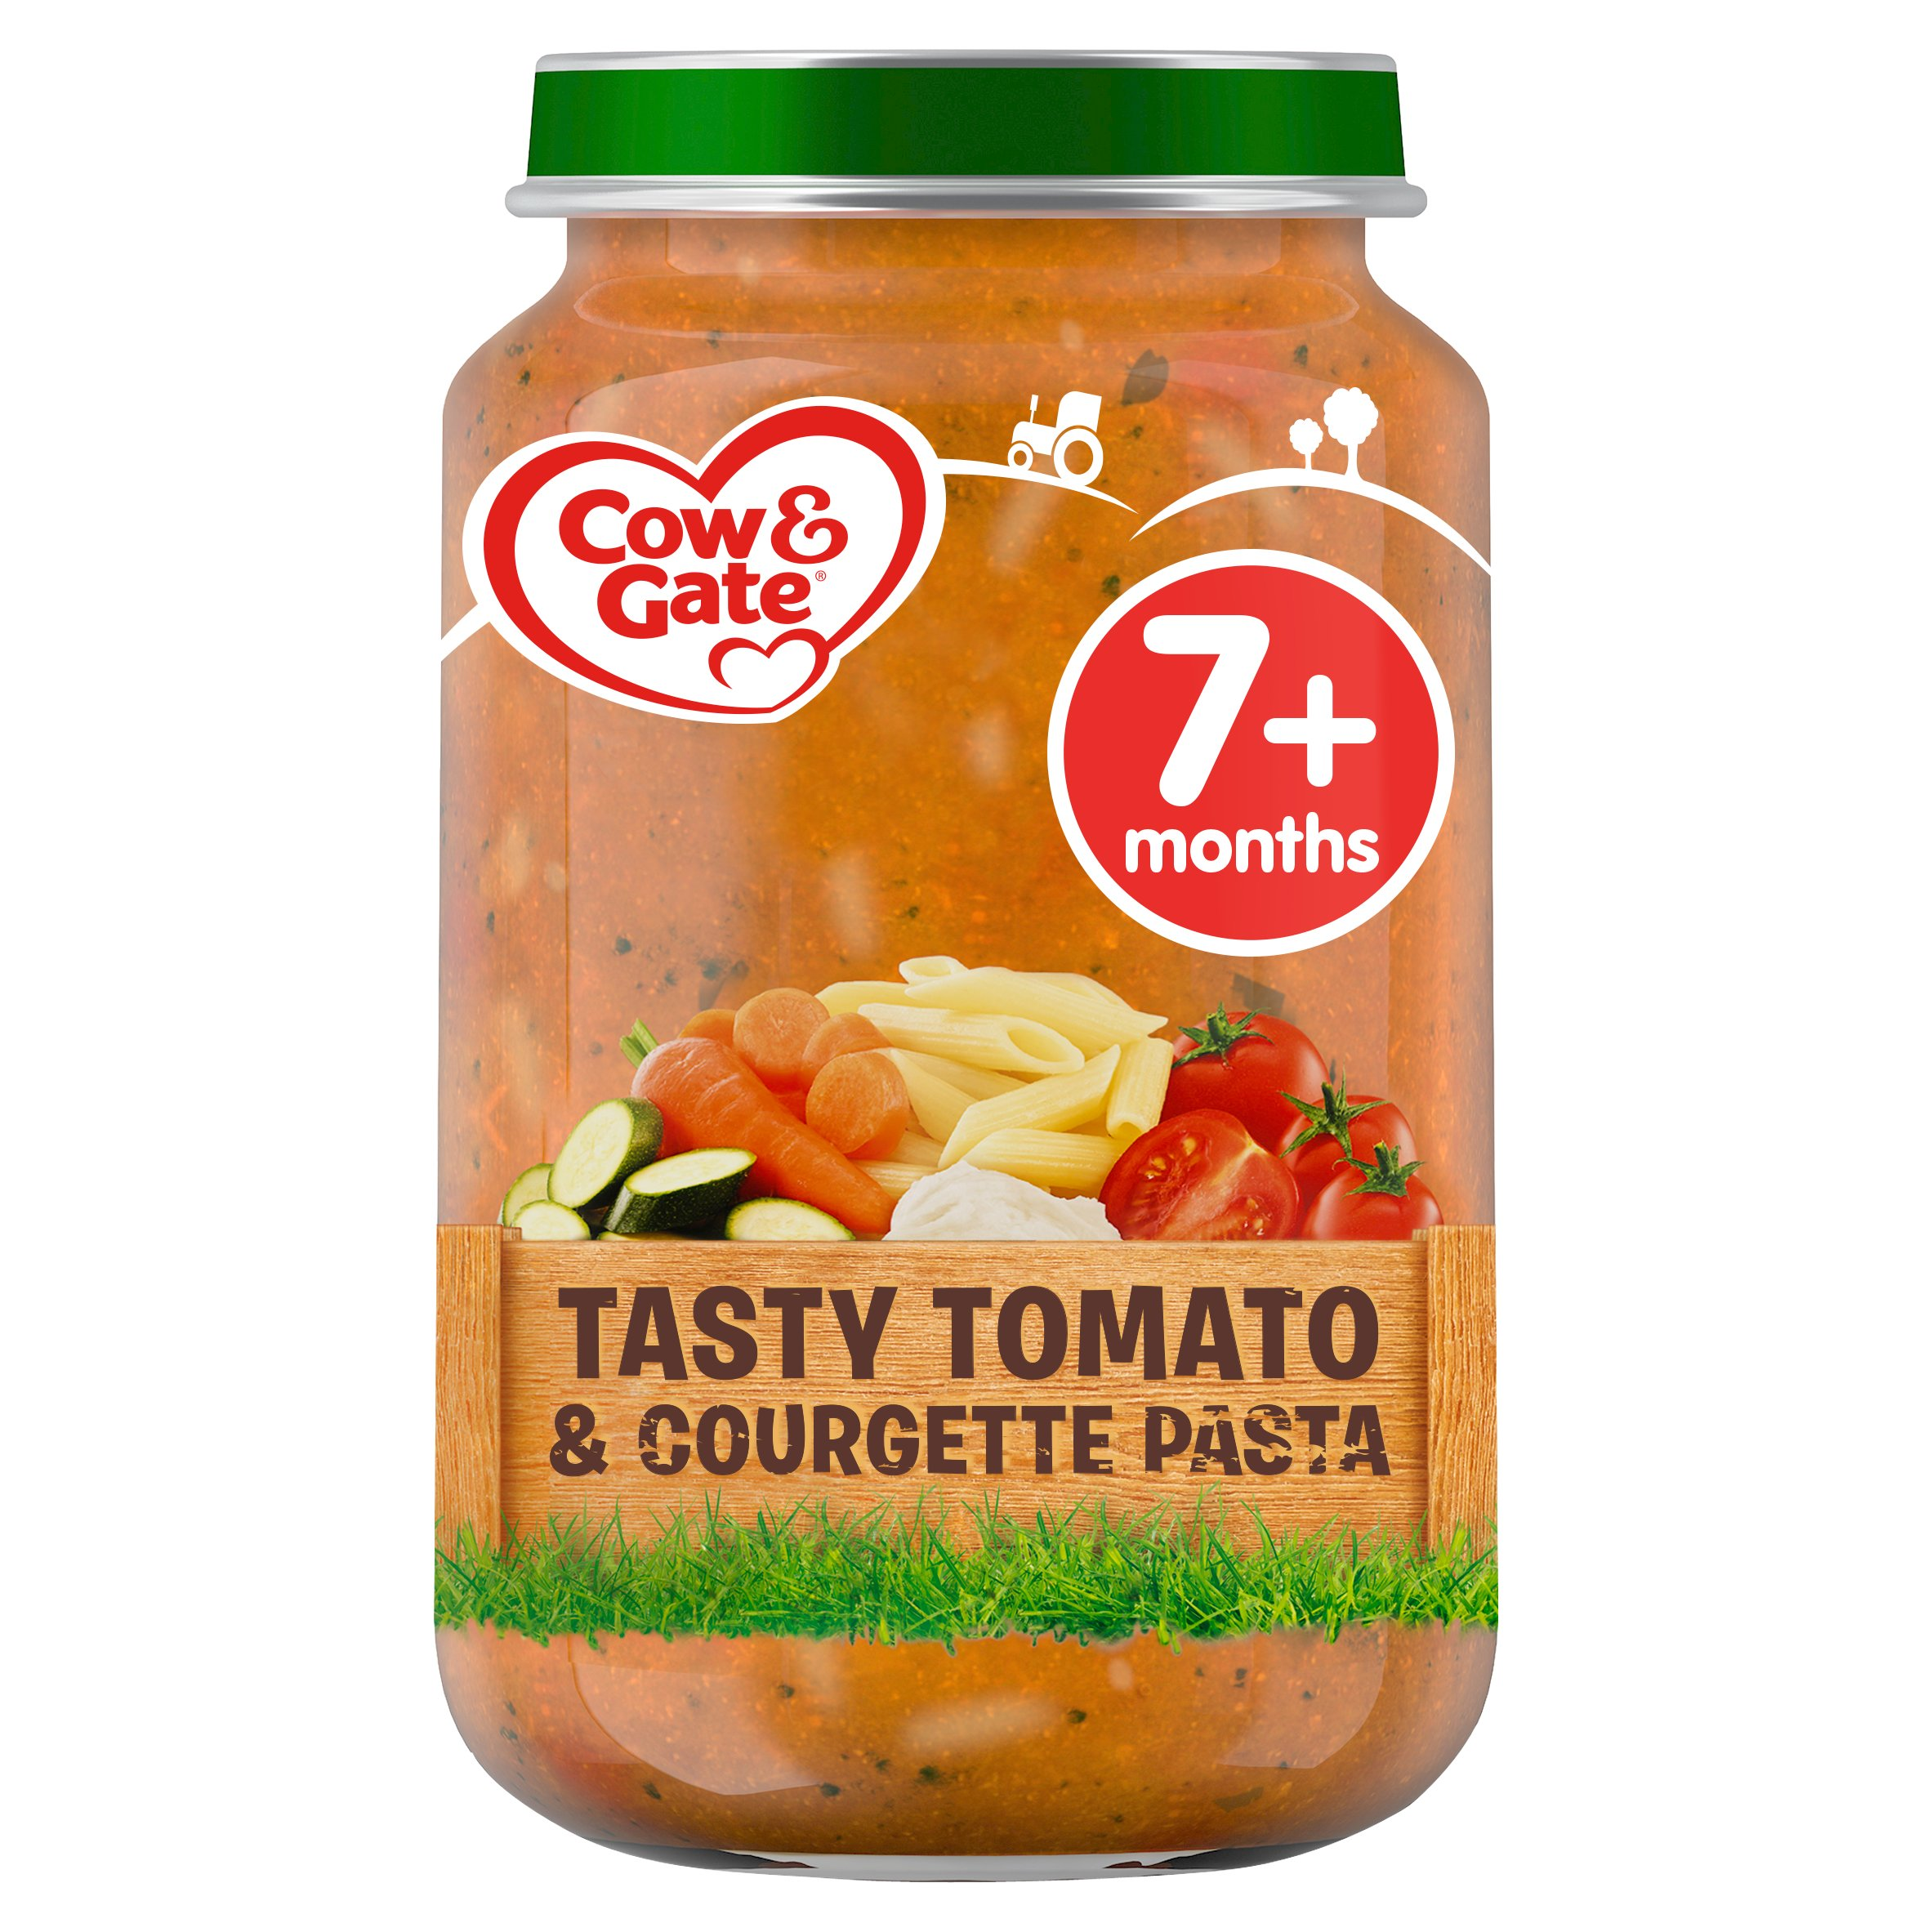 Cow & Gate Cheesy Pasta Courgette Pasta 7Mth+ 200G Jar